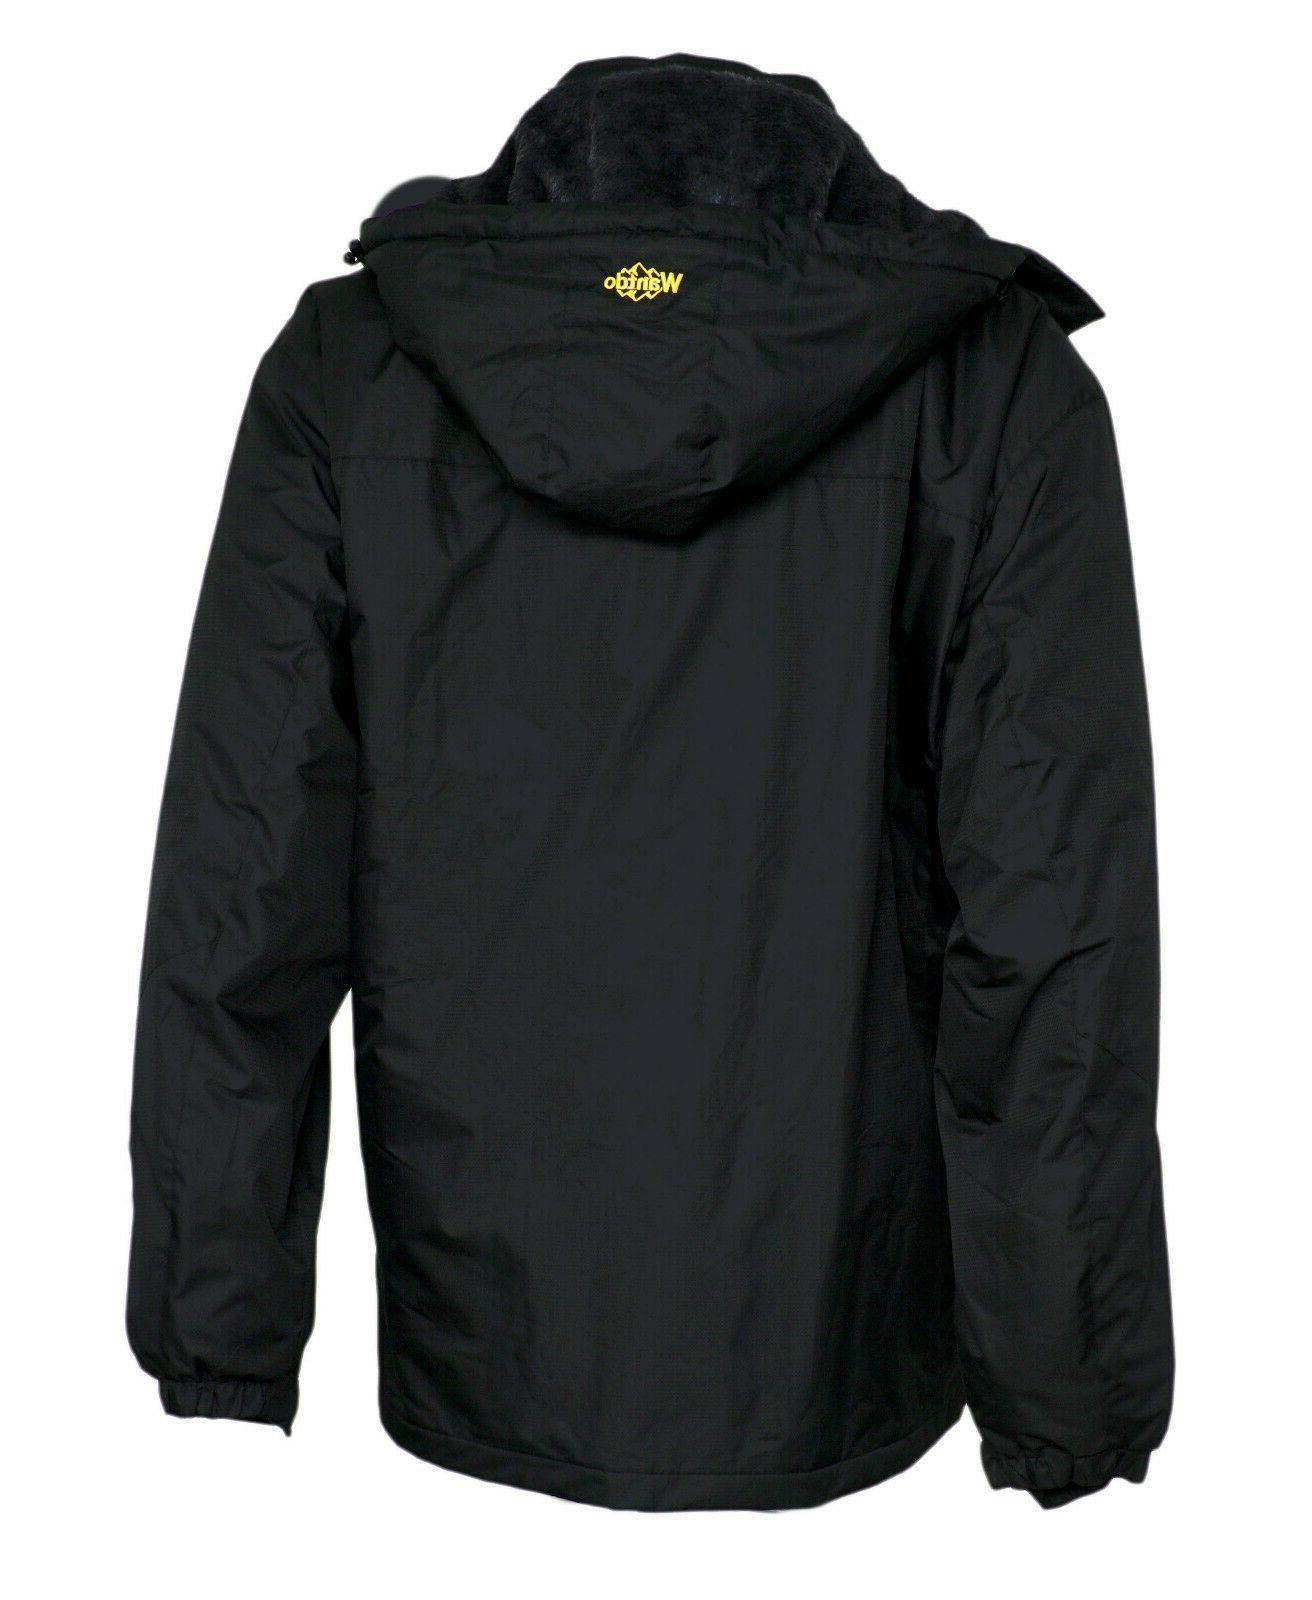 WANTDO Jacket Windproof